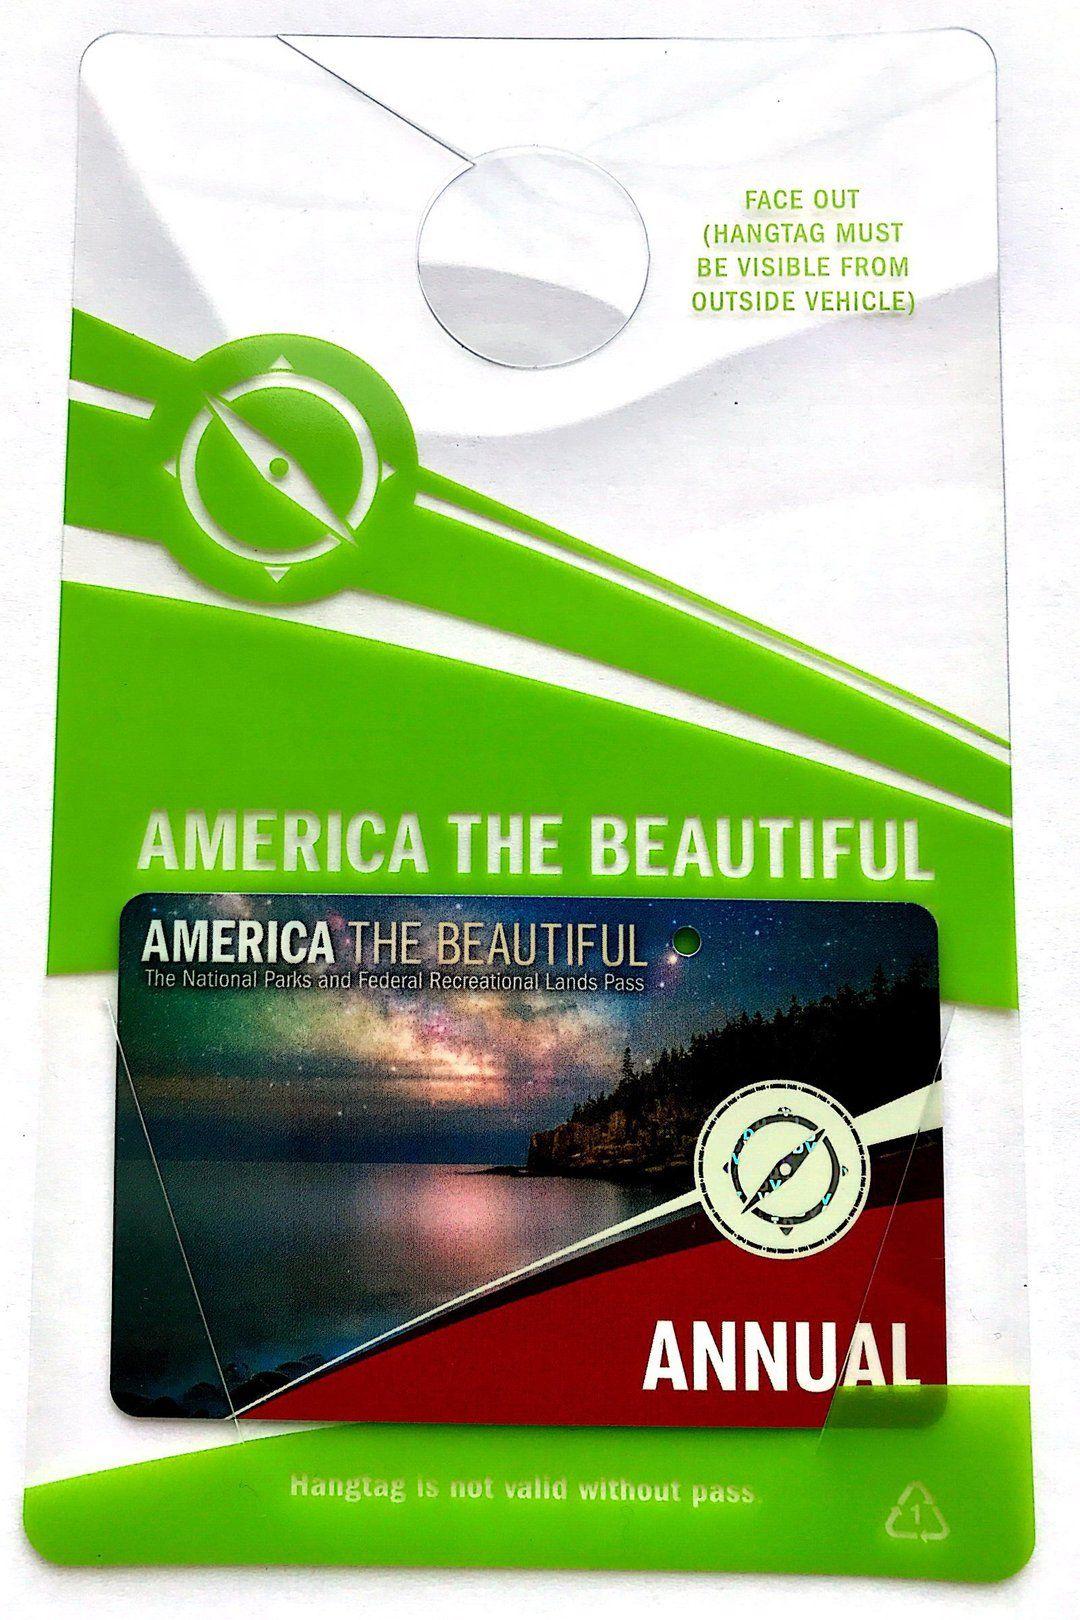 America the Beautiful National Park Pass Expires April